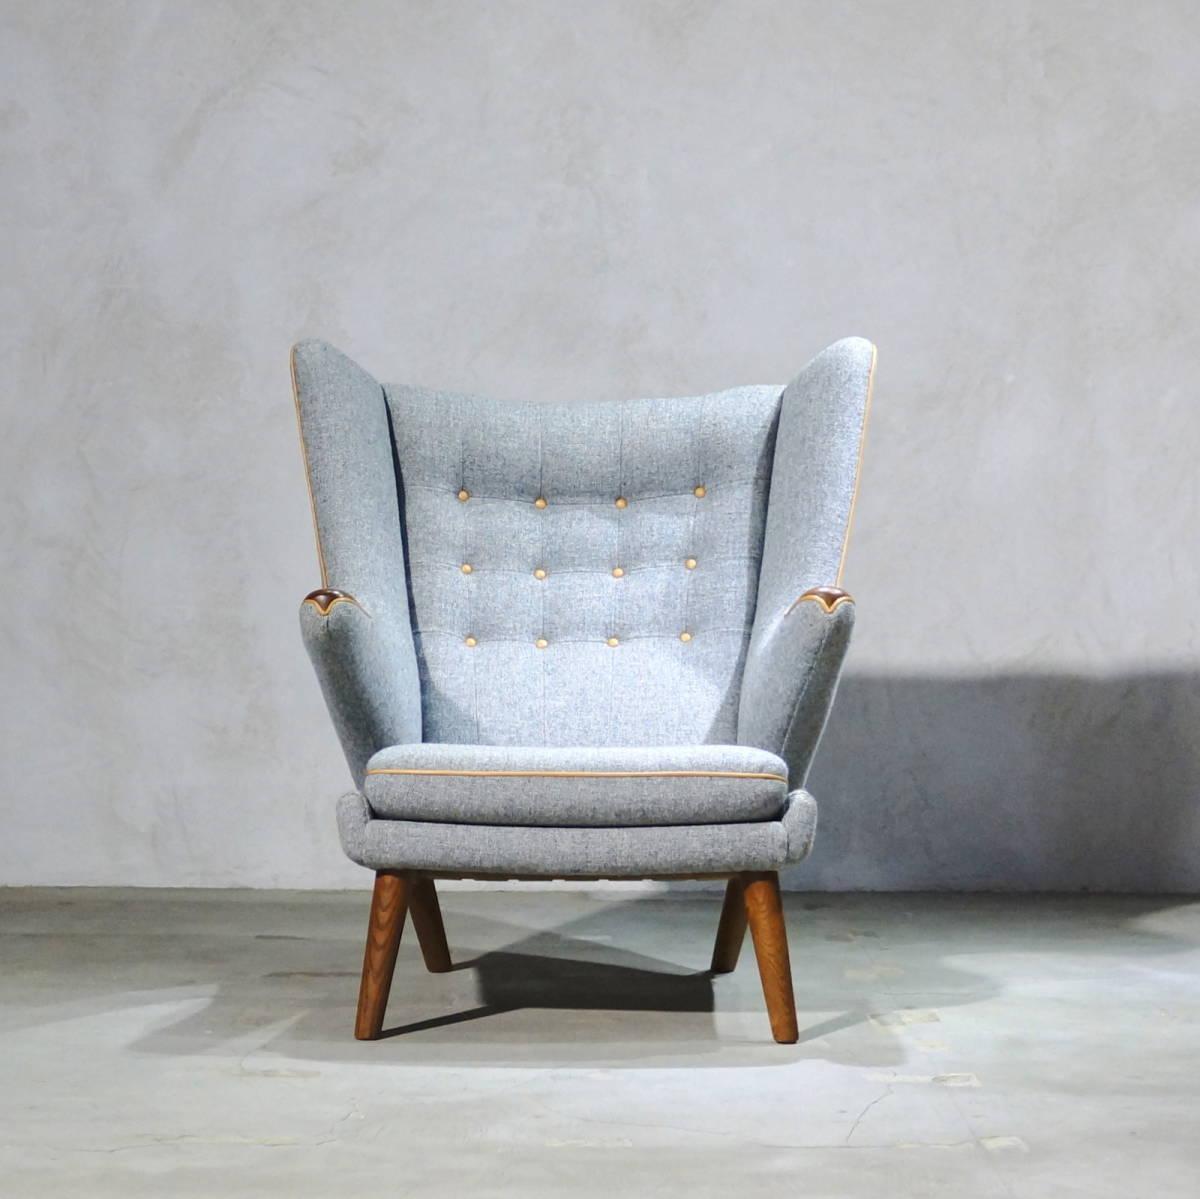 Hans J. Wegner ウェグナー AP-19 Bear Chair ベアチェア Teak & Oak チークオーク ※フィンユール モーエンセン